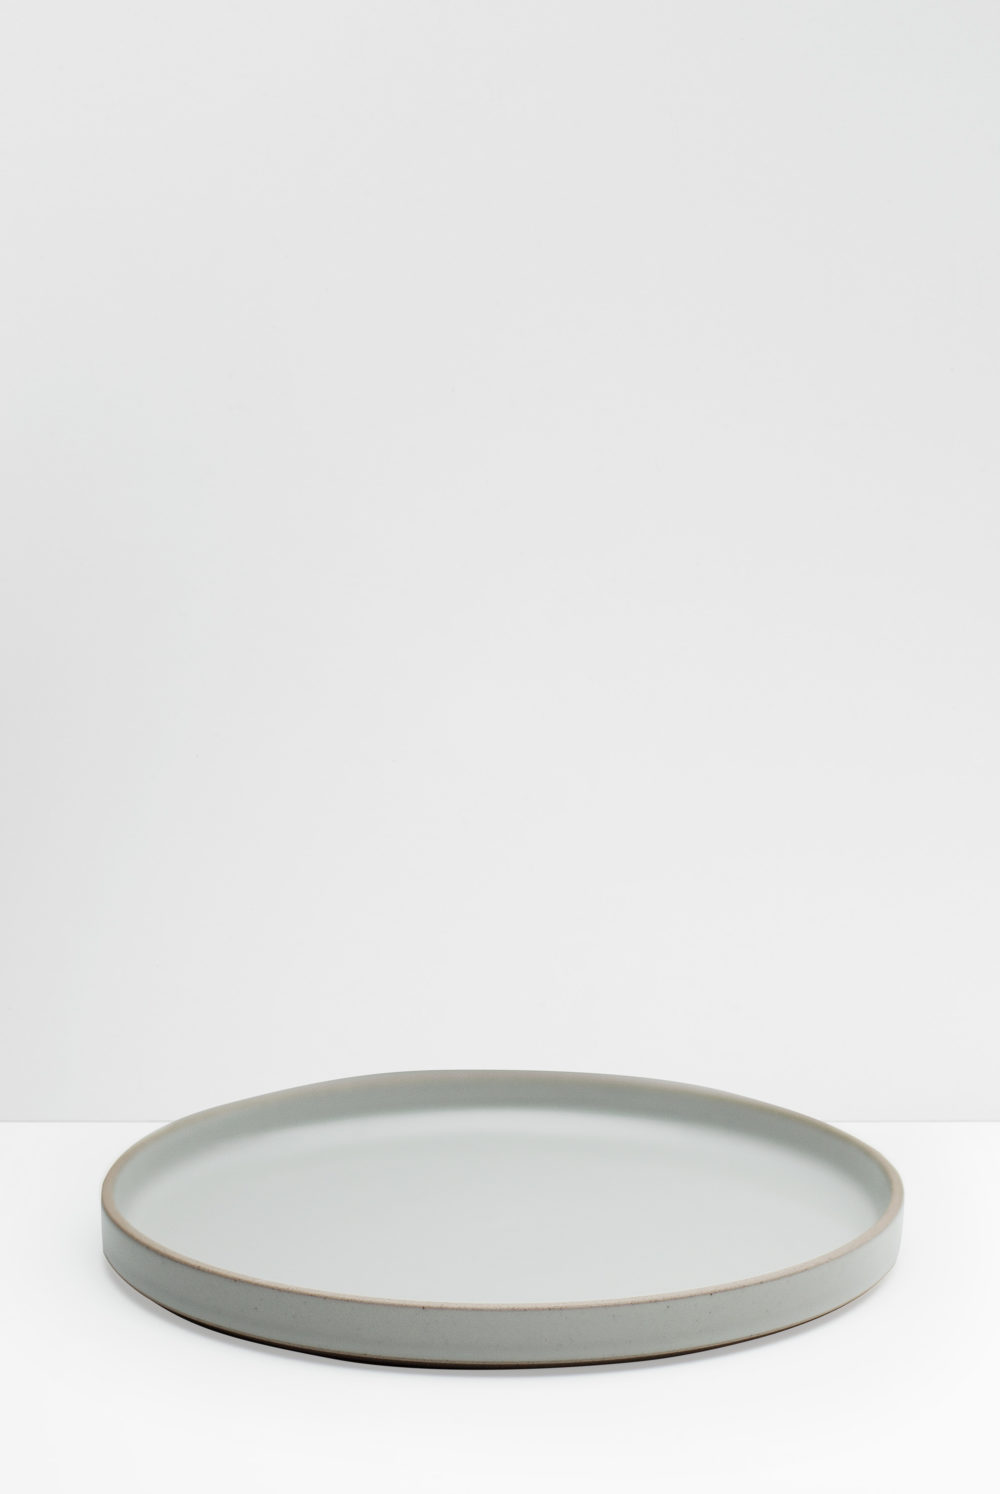 Hasami Porcelain large dinner plate